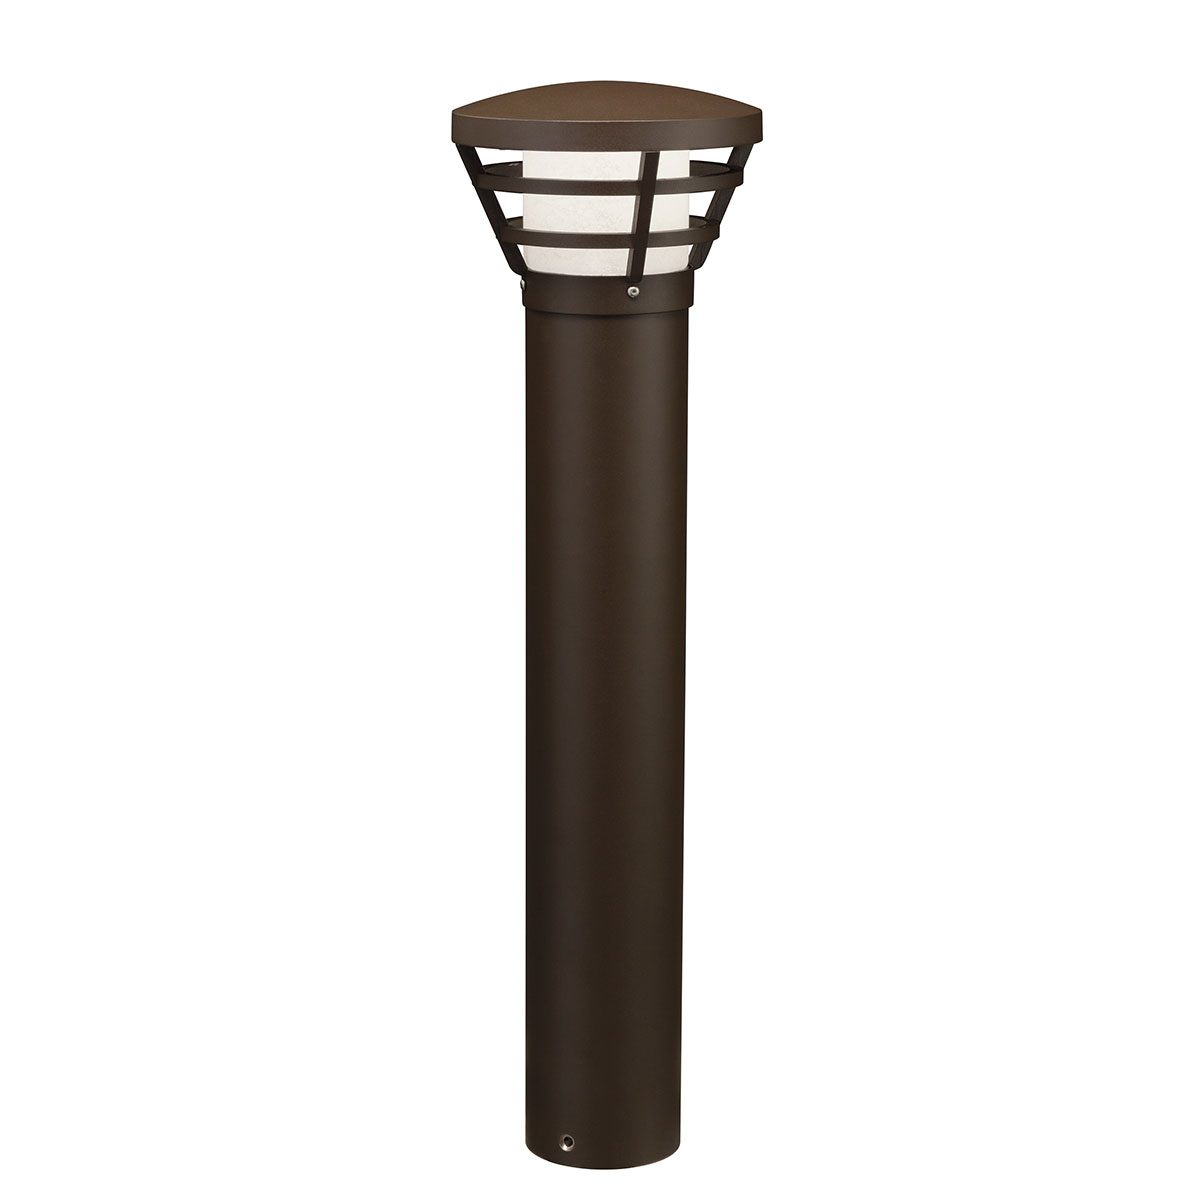 16133AZT28 KICHLER SOFT CCONTEMPORARY LED BOLLARD